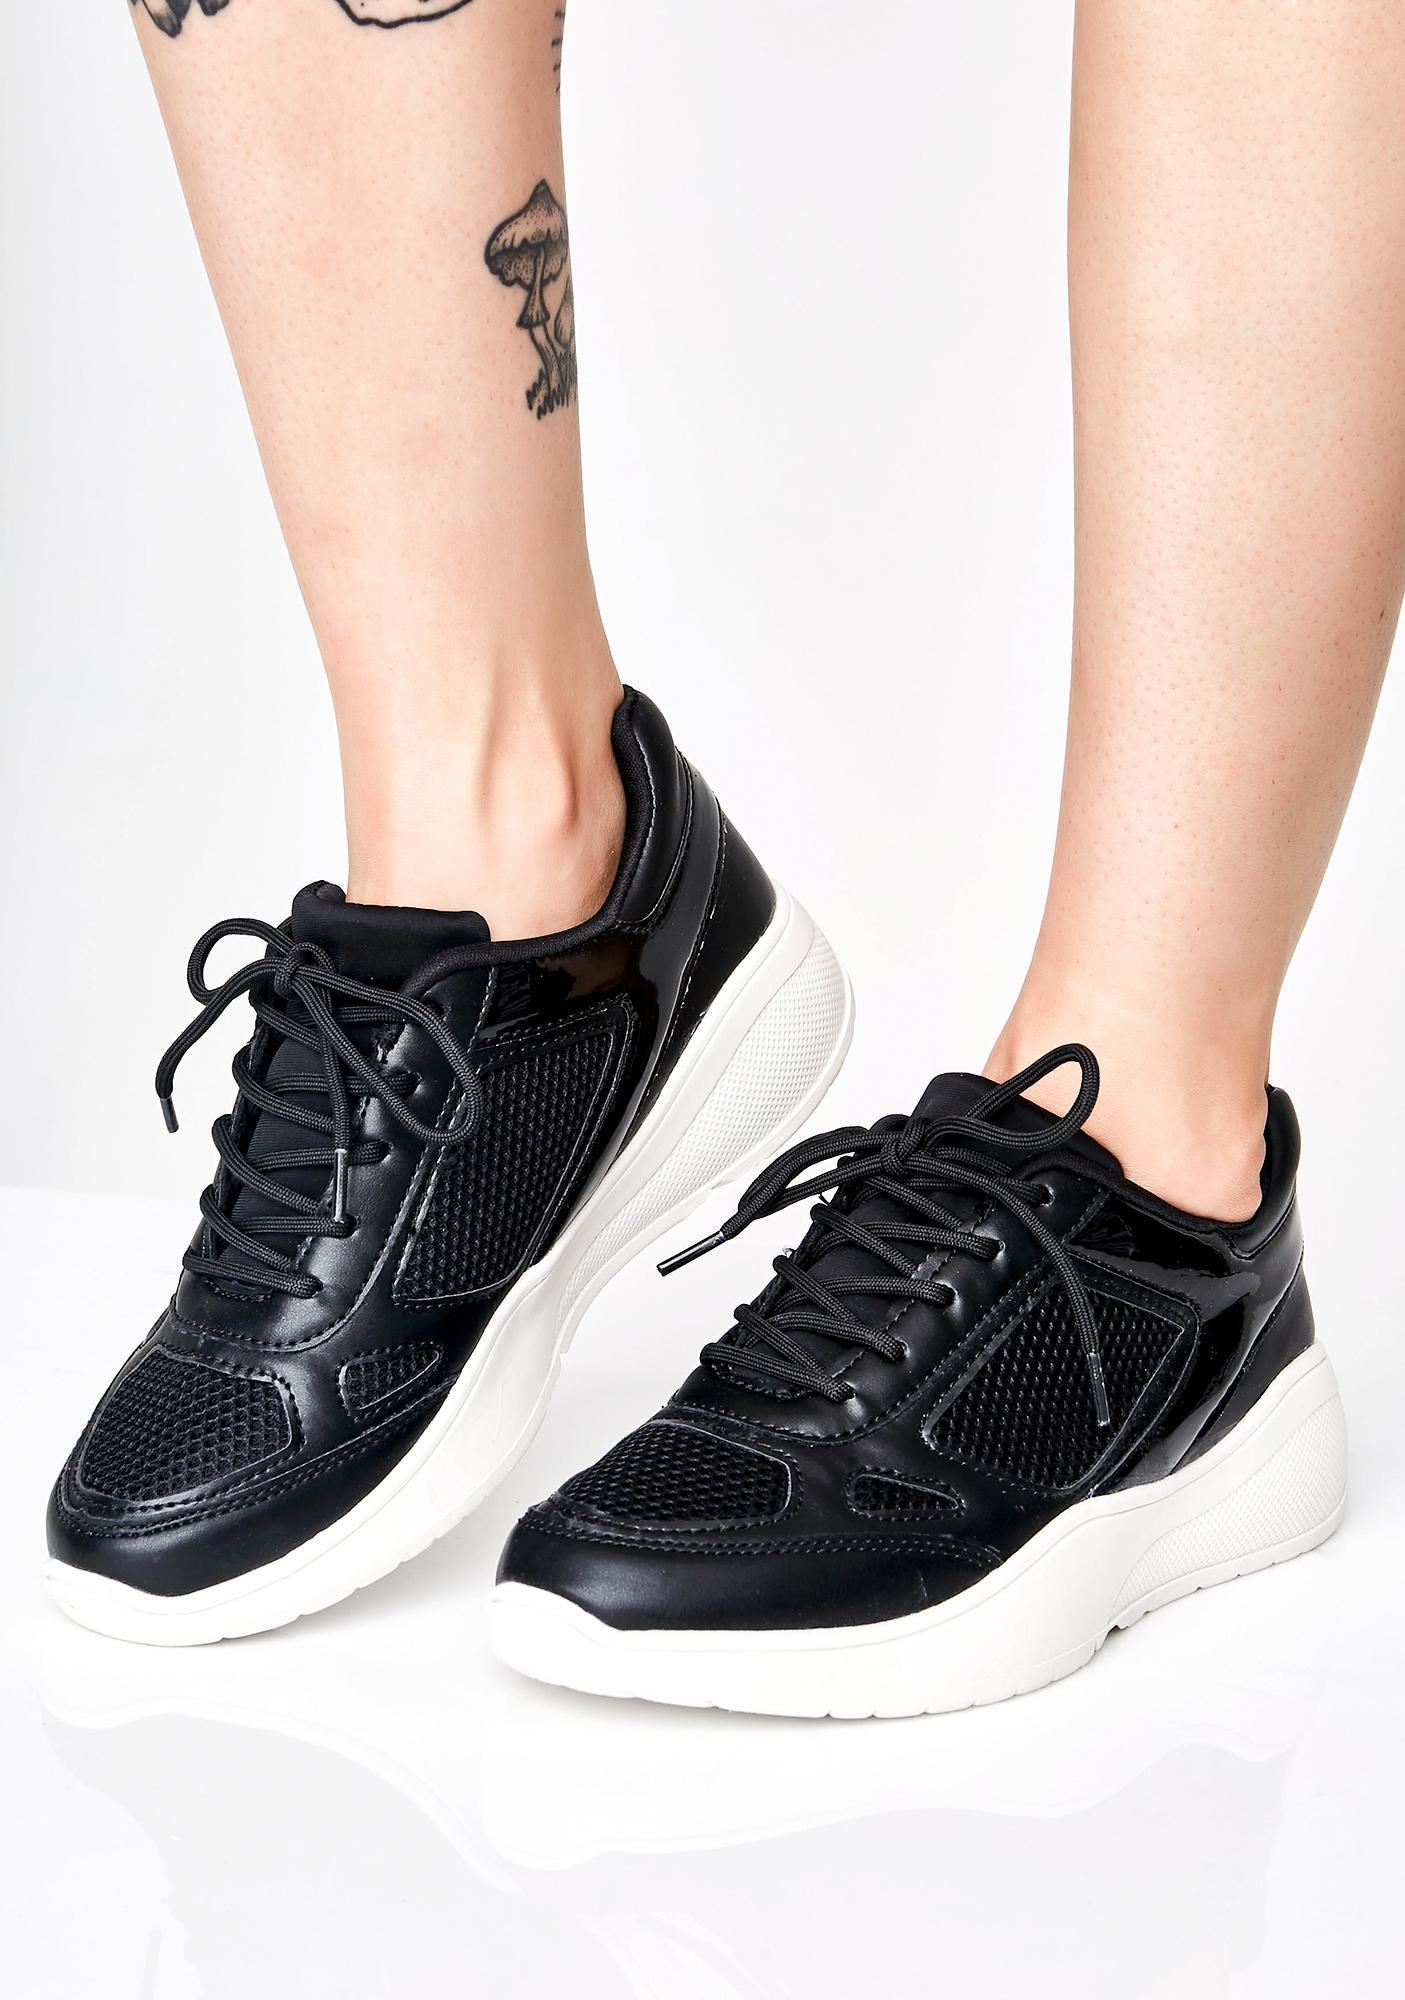 Vegan Leather Dad Sneakers | Dolls Kill